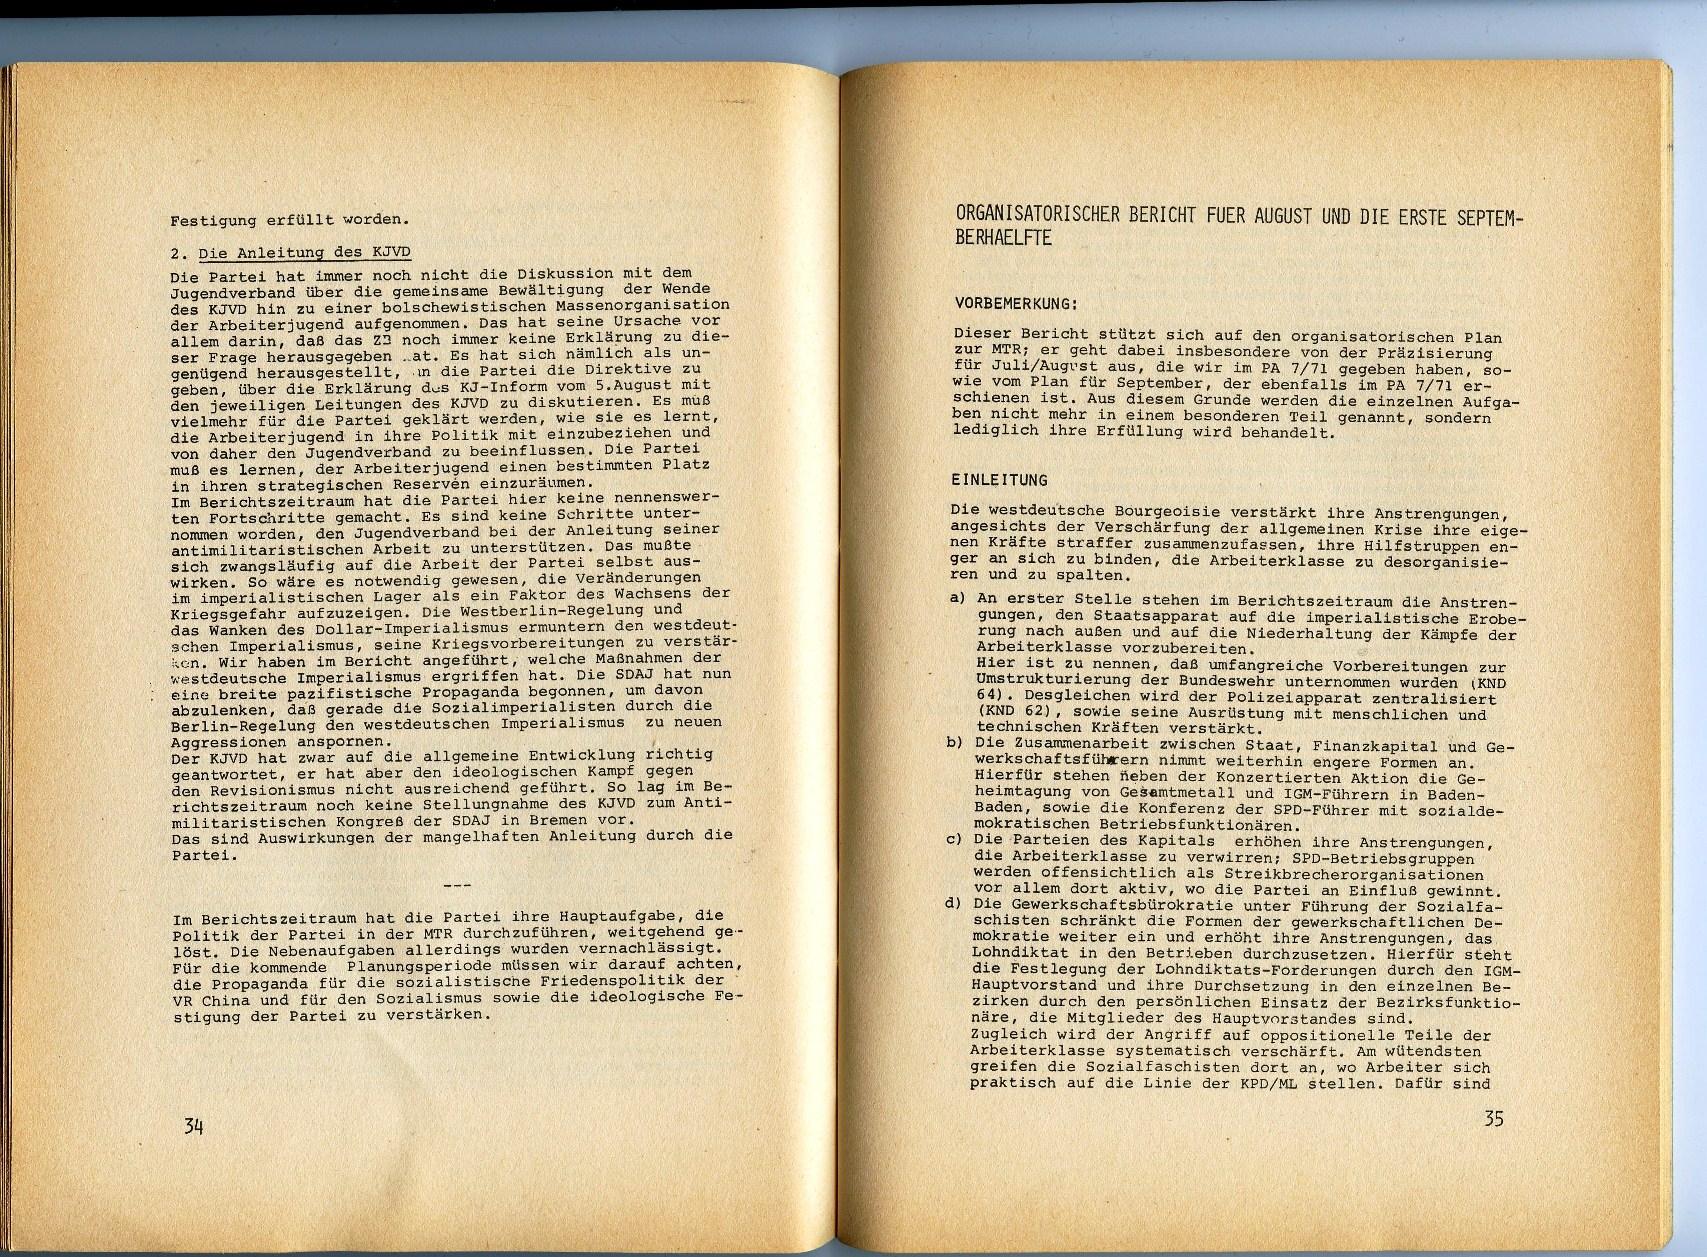 ZB_Parteiarbeiter_1971_08_19